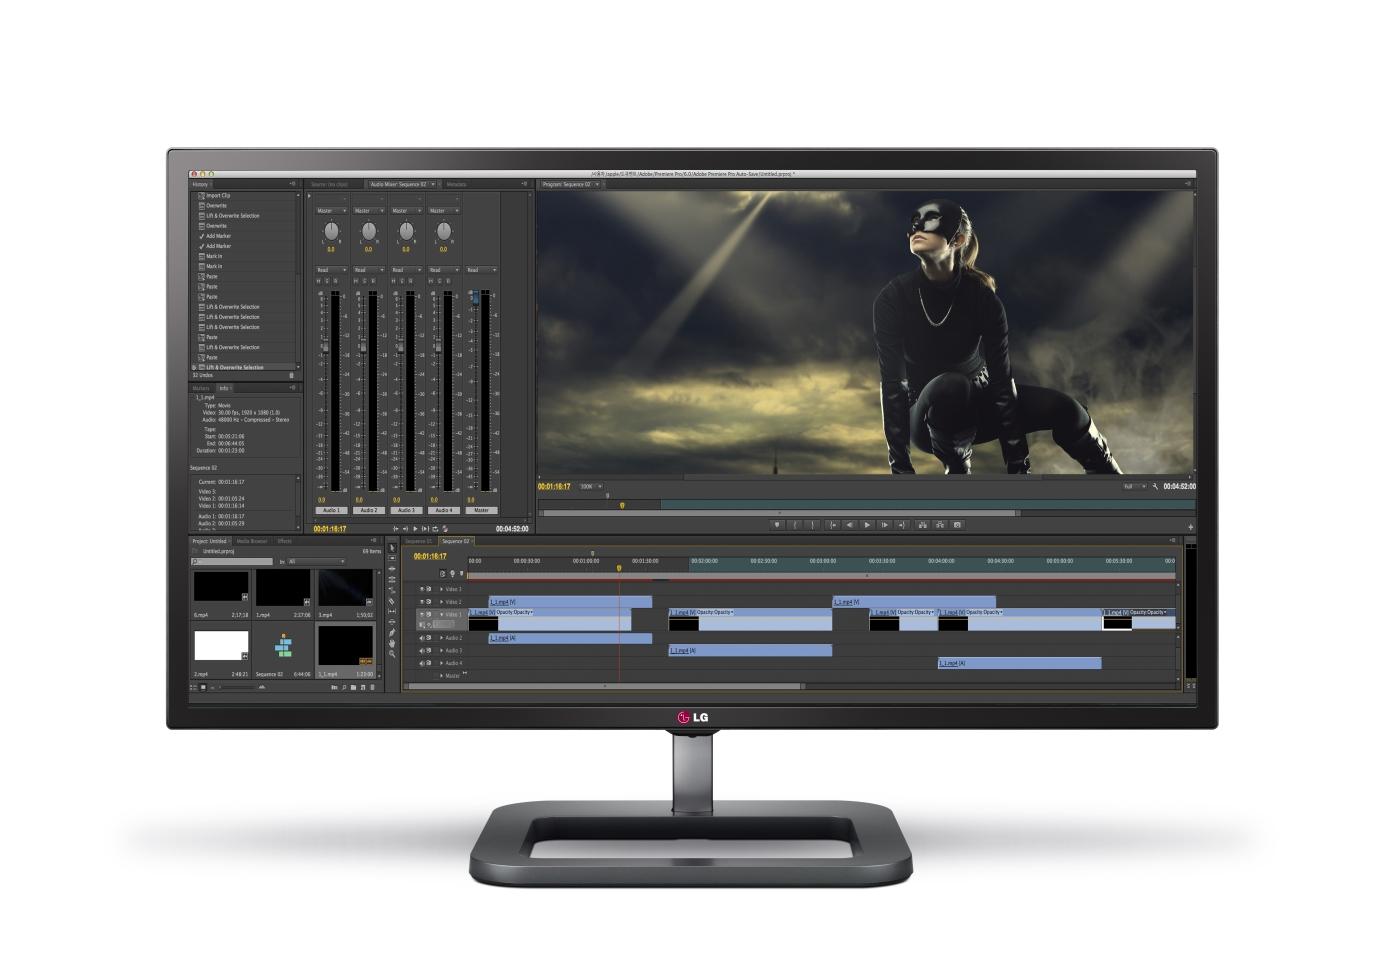 Introducing LG's Digital Cinema 4K Monitor, the Ultimate Display